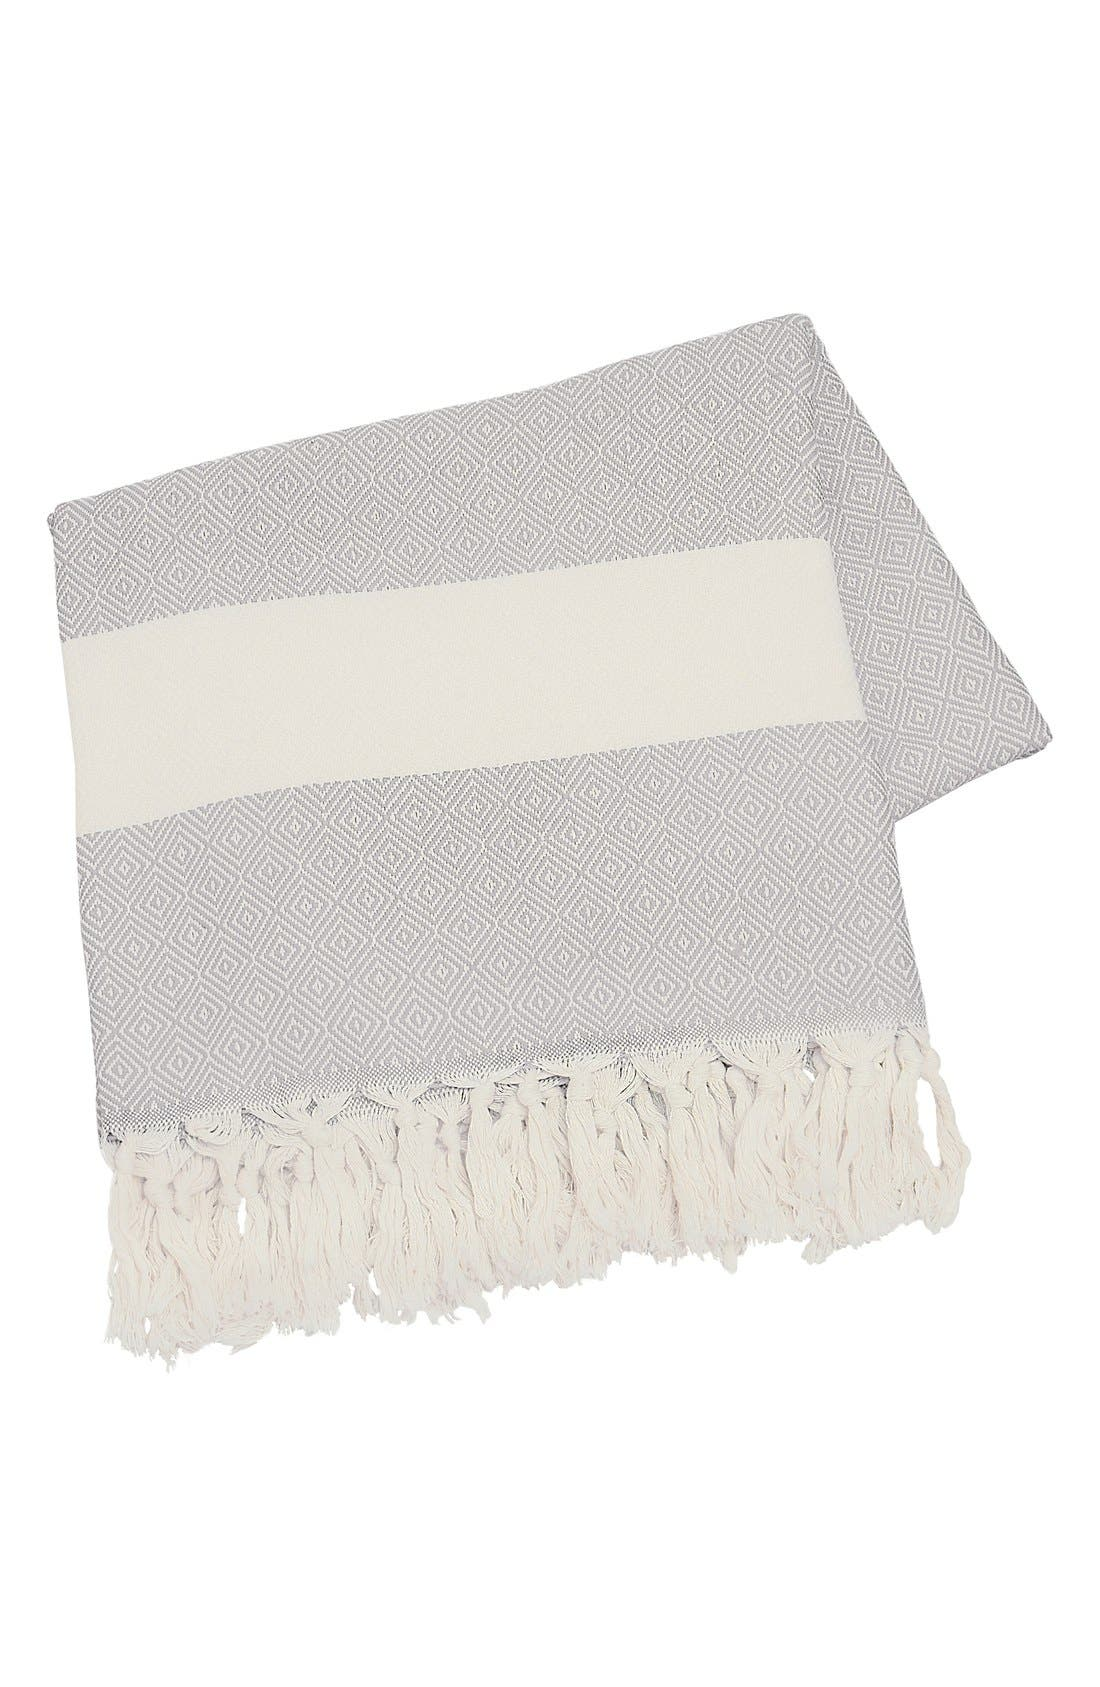 Monogram Turkish Cotton Throw,                             Main thumbnail 2, color,